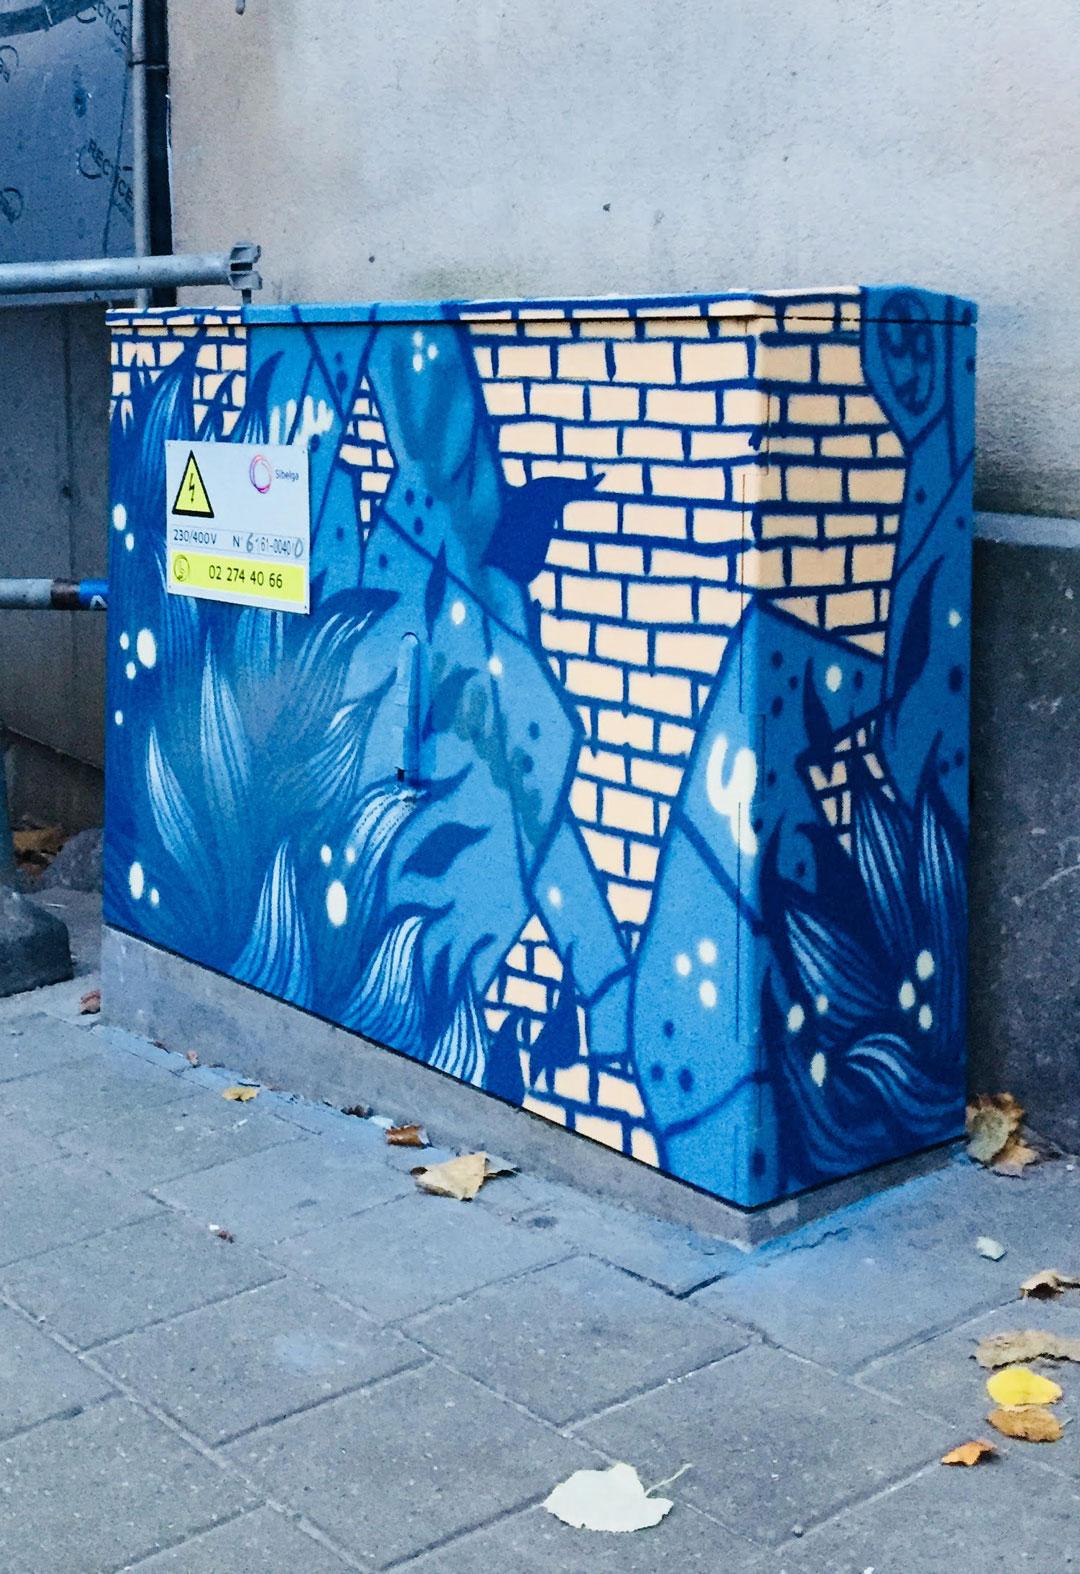 https://www.propaganza.be/wp-content/uploads/2020/02/mobilier-urbain-_-artiste-WENC-_-Ixelles.jpg